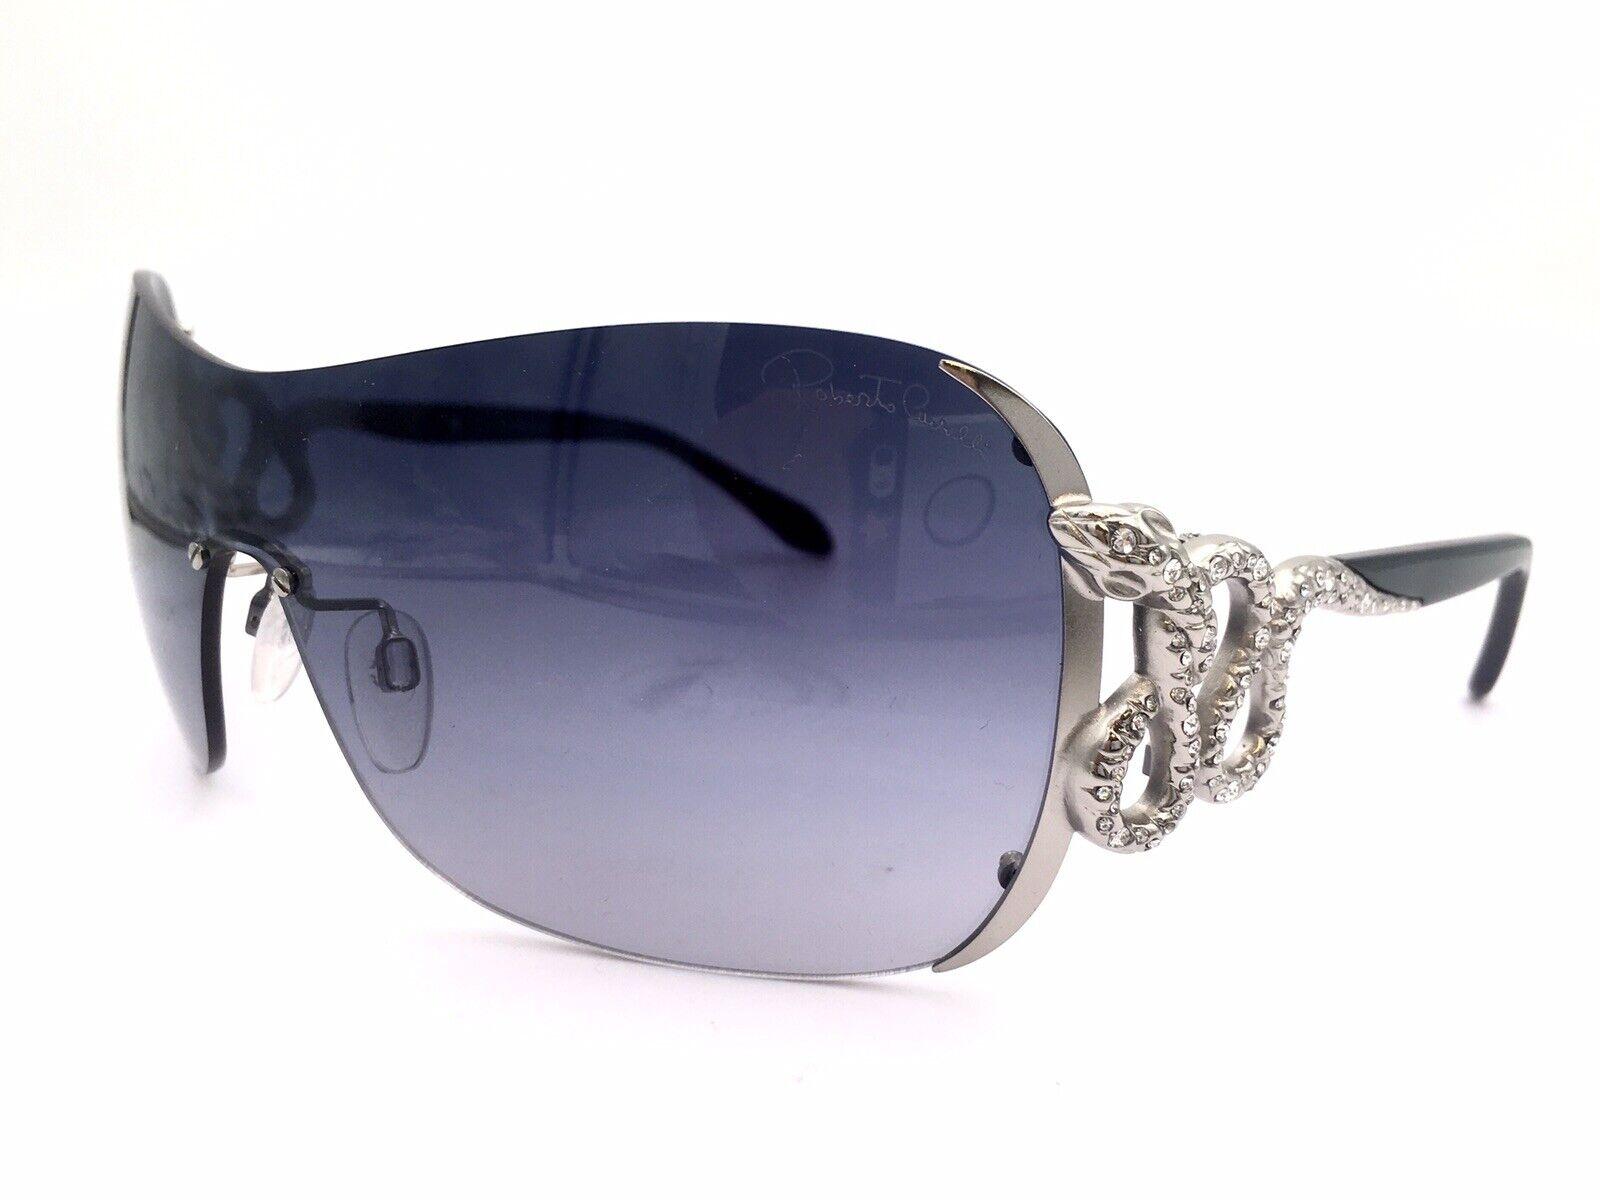 Roberto Cavalli Mens Designer Sunglasses 58-16-125 Shiny Black//Smoke